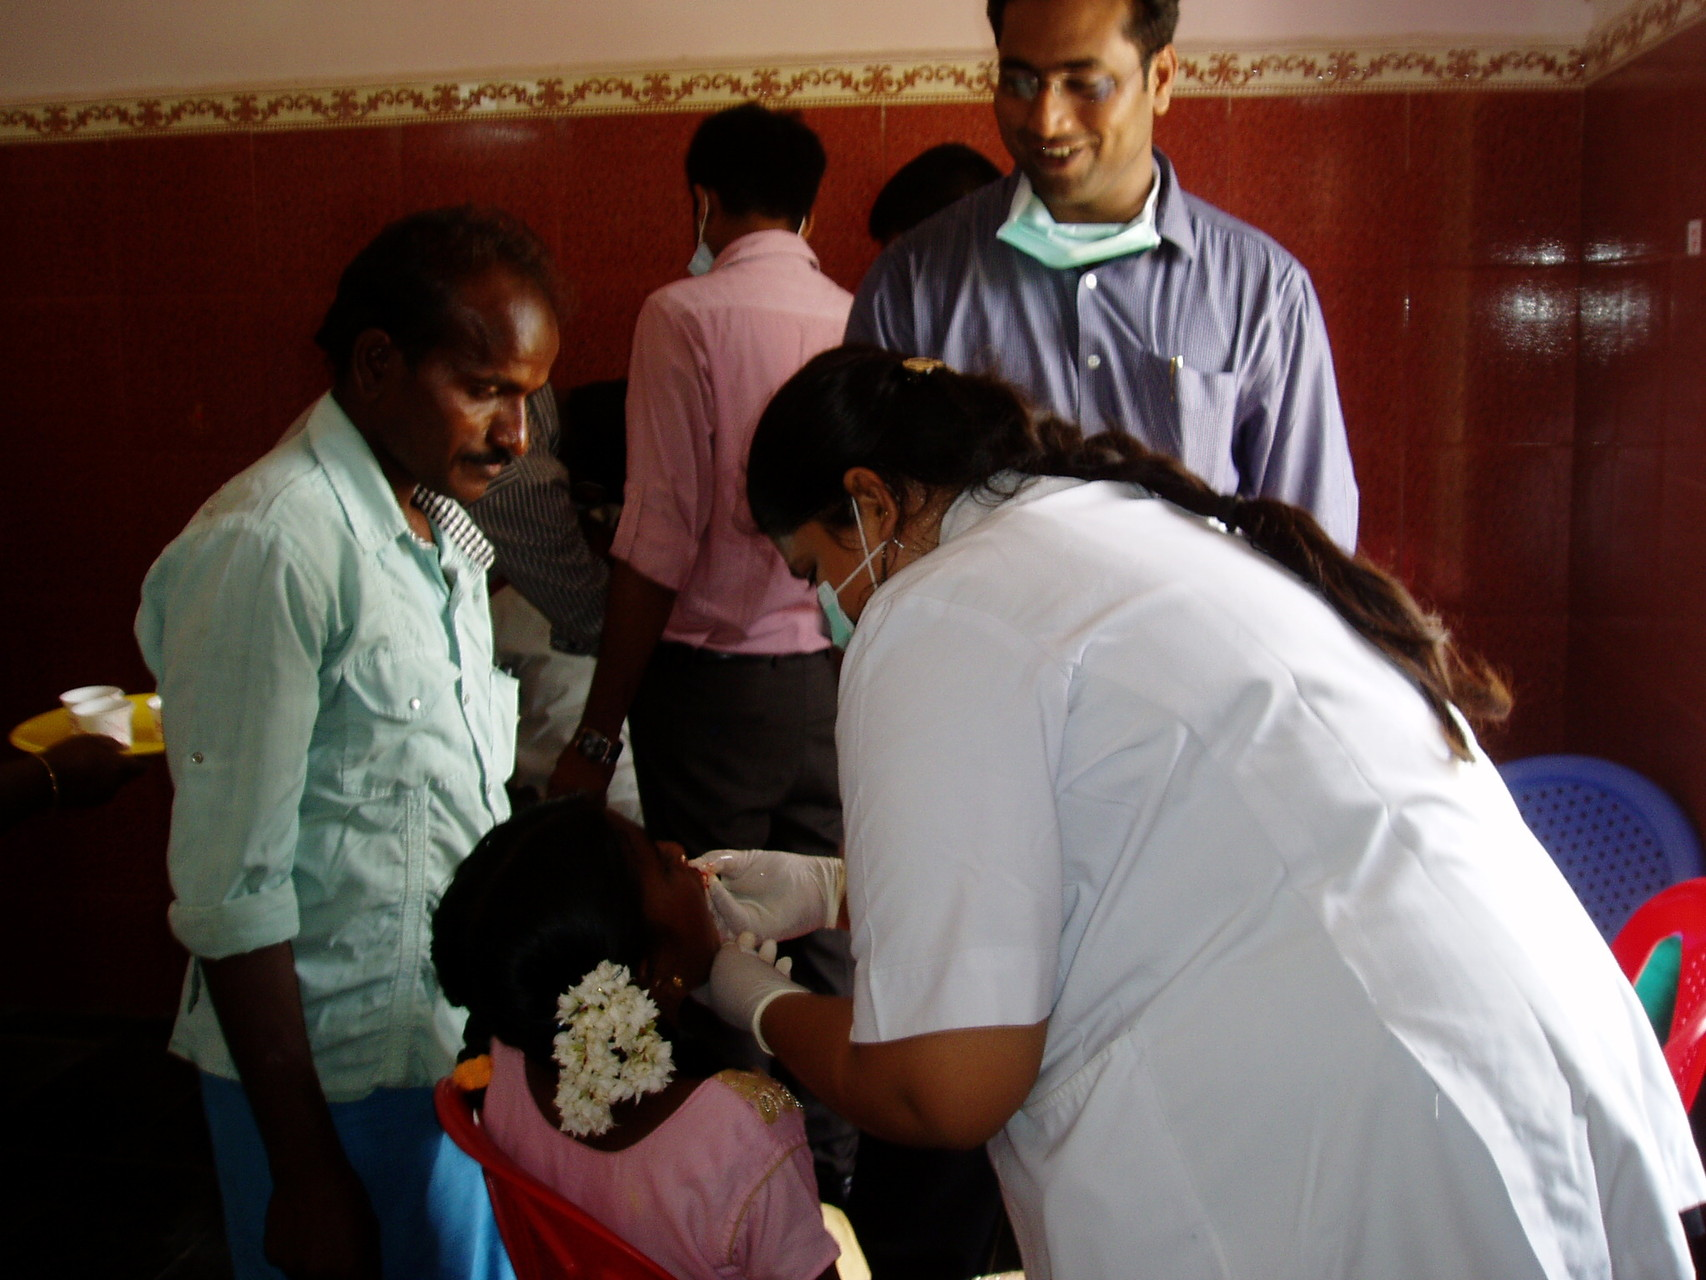 Avril 2014 - Examen dentaire